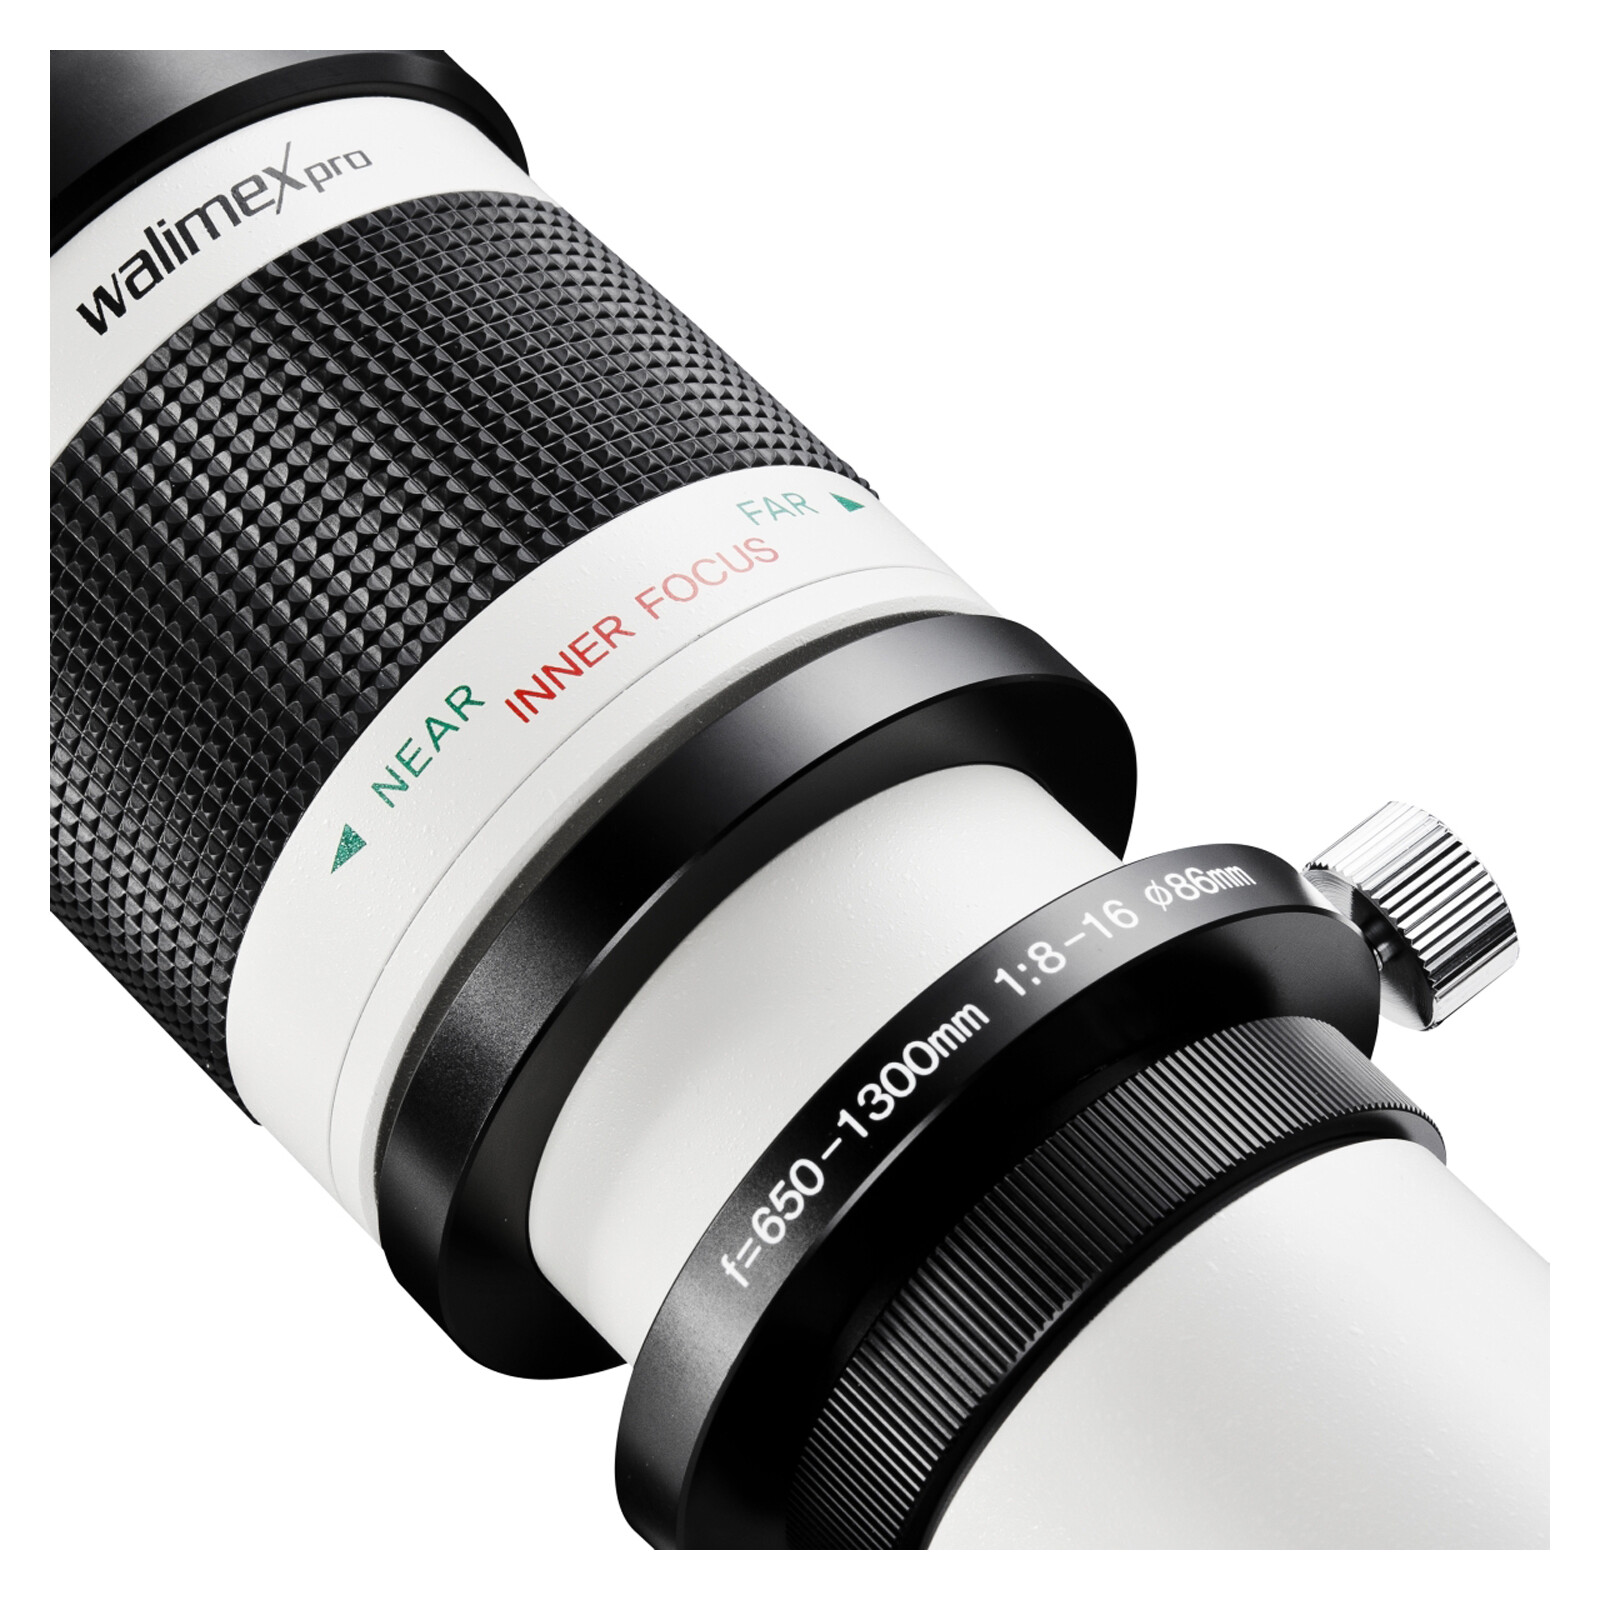 walimex pro 650-1300/8-16 DSLR Sony E mit Adapter